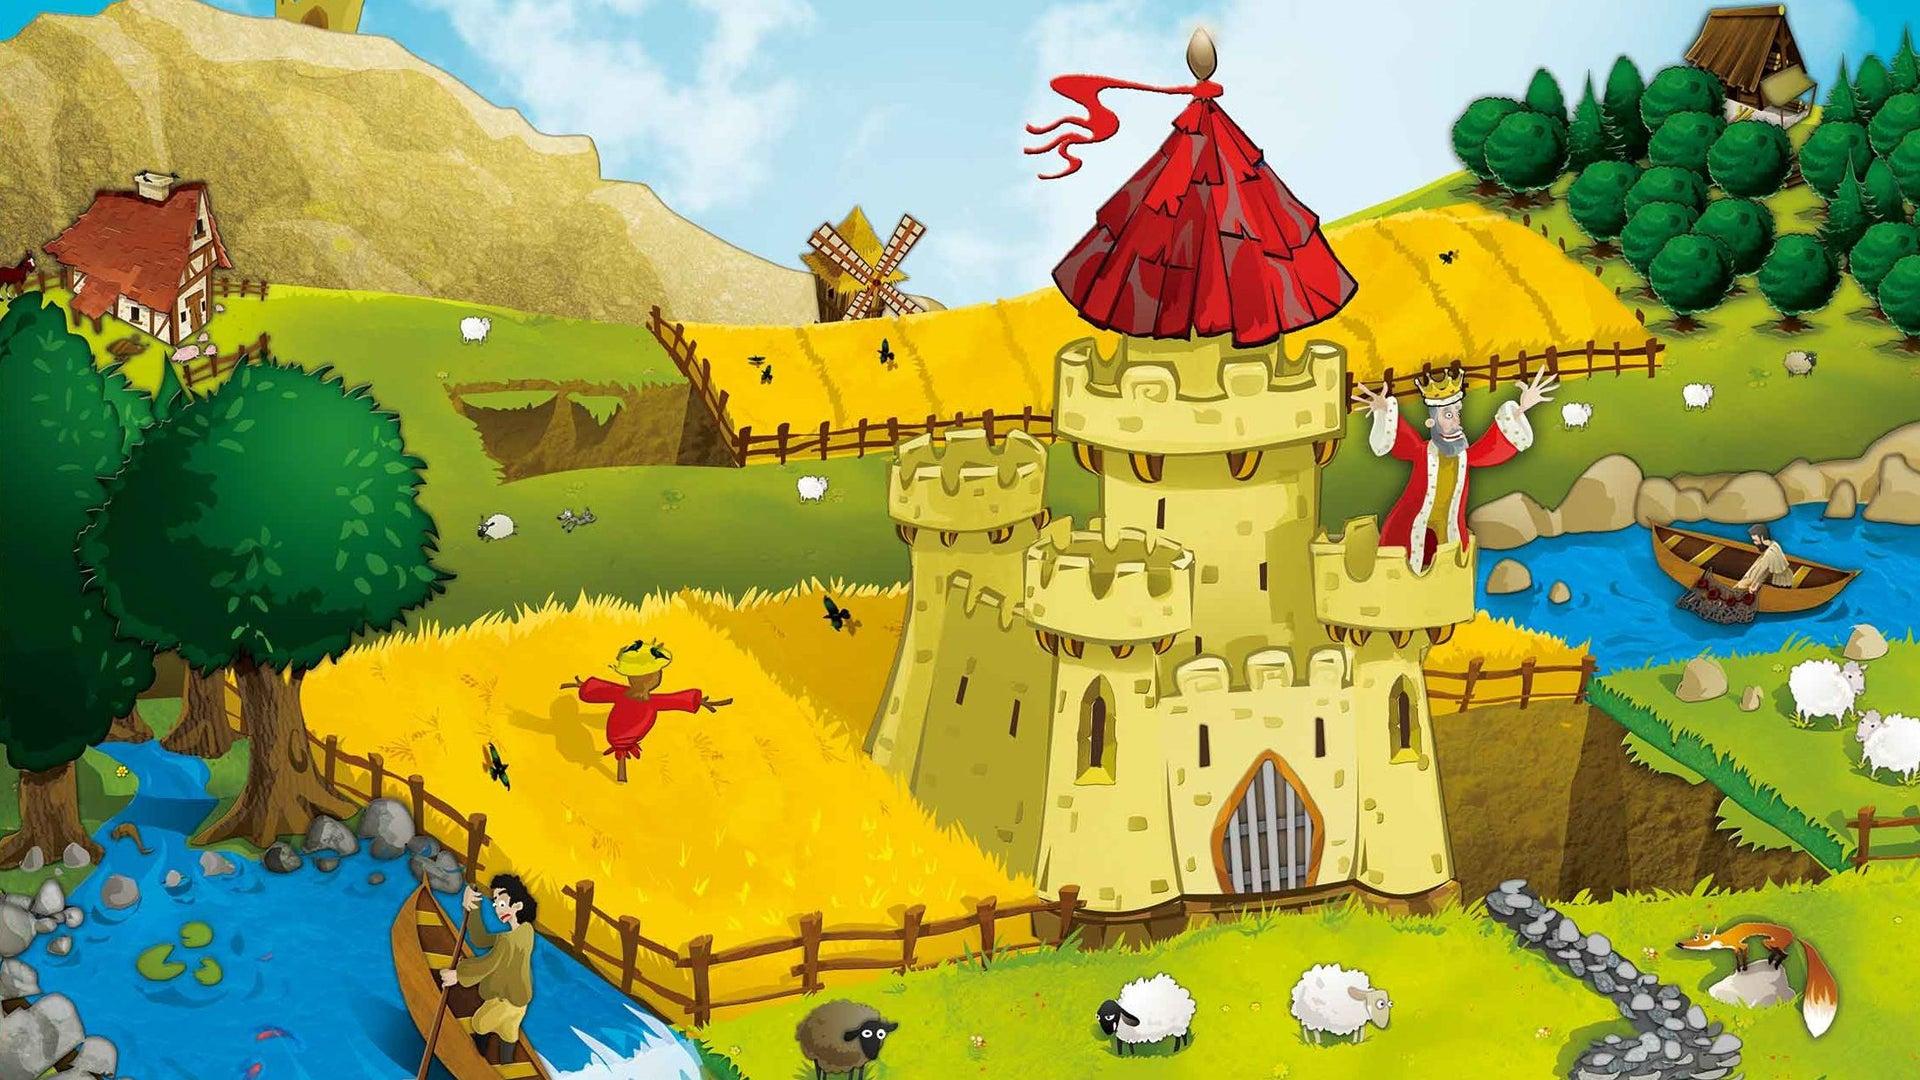 kingdomino-board-game-box-artwork.jpeg